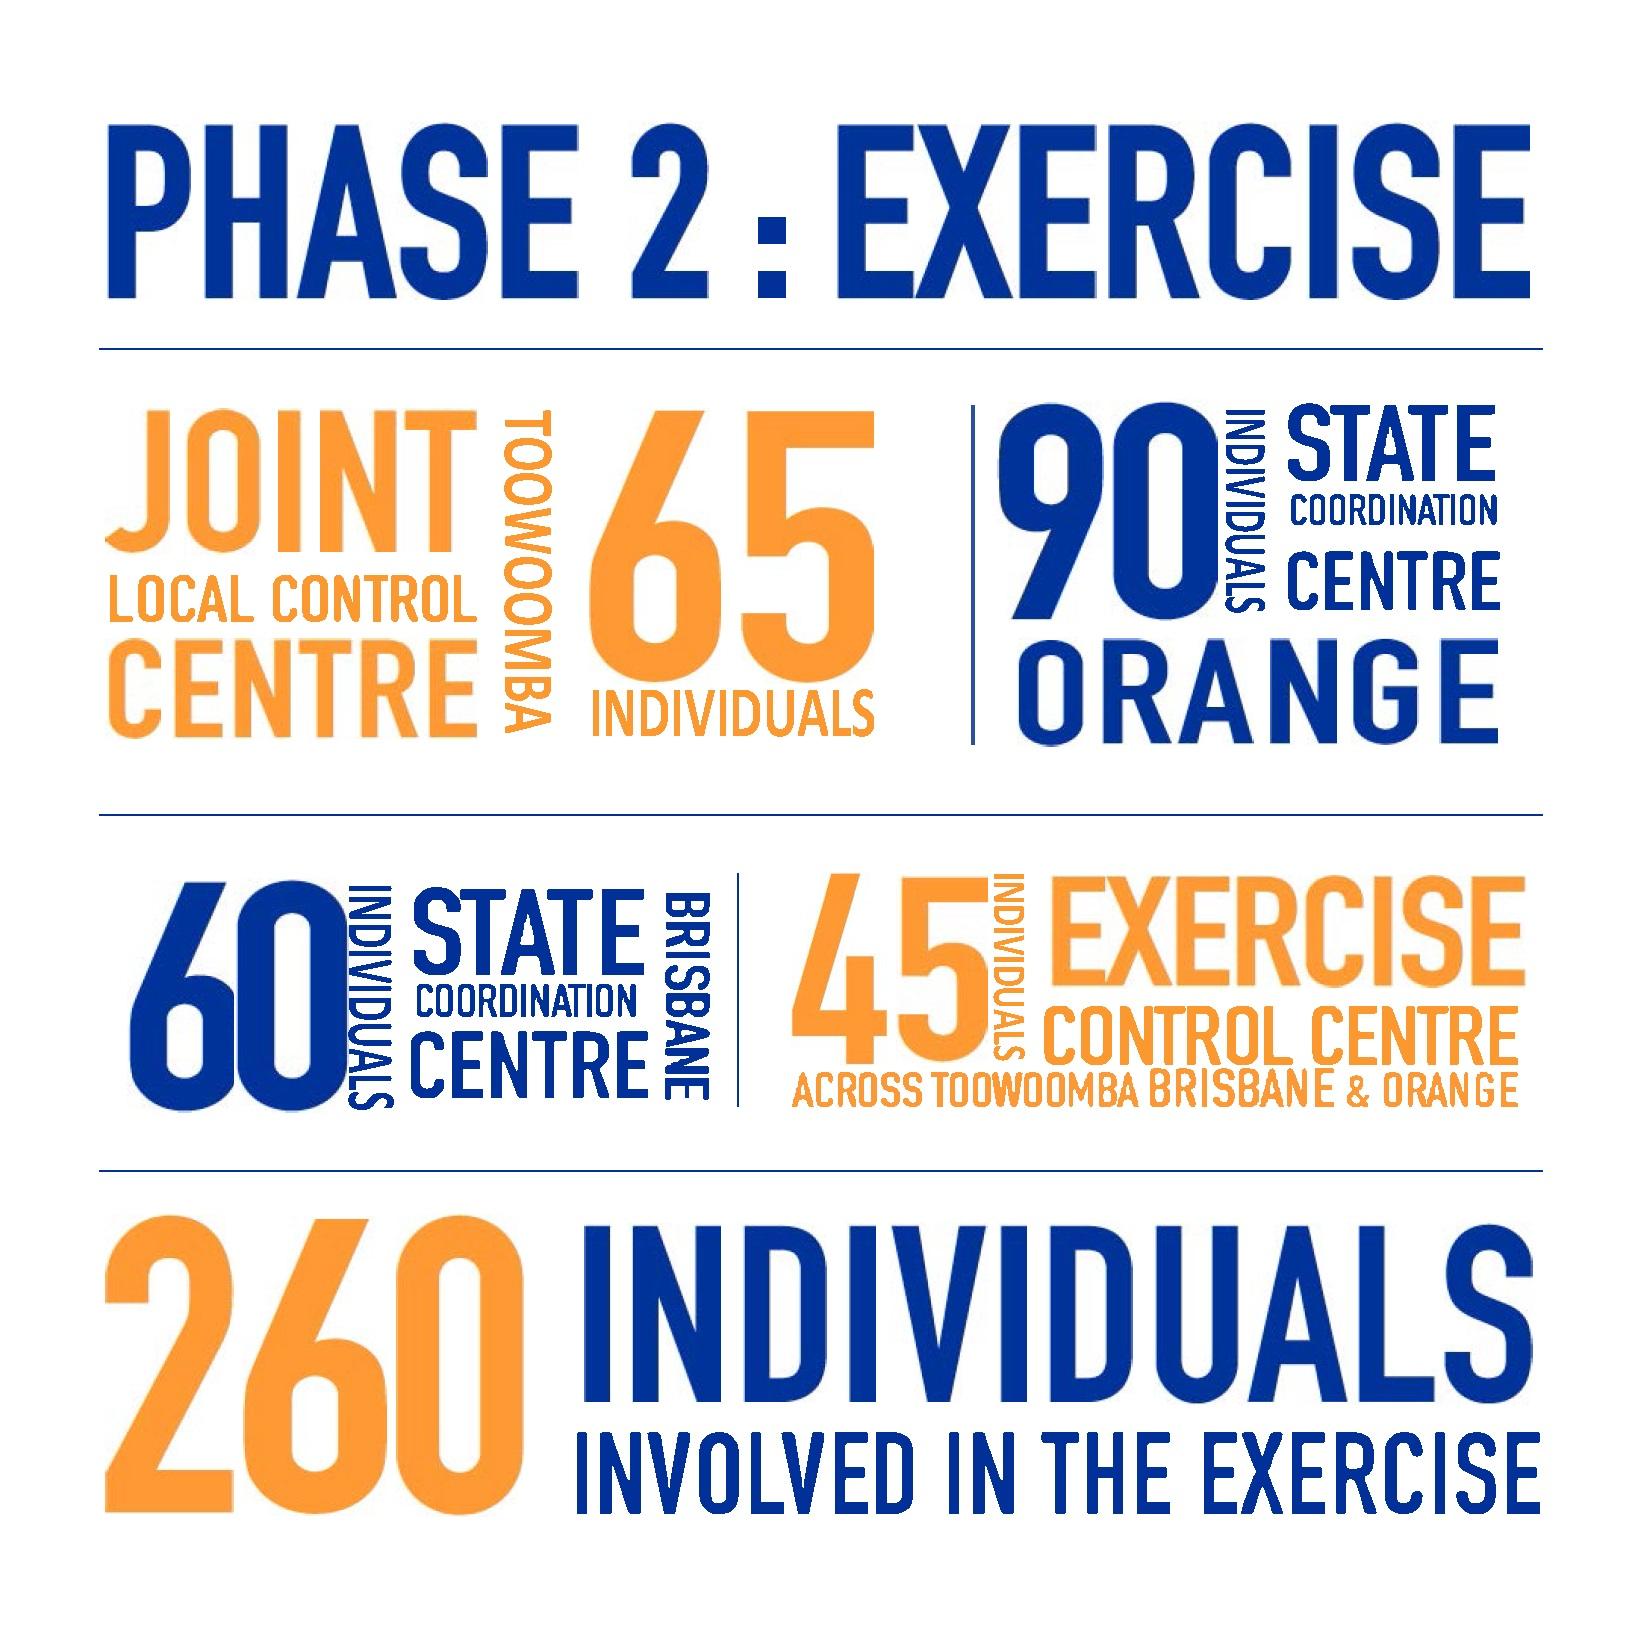 Phase 2: Exercise, Joint LCC Toowoomba 65 Individuals. 90 Individuals SCC Orange. 60 Individuals SCC Brisbane. 45 Individuals ECC across Toowoomba, Brisbane & Orange. 206 Individuals involved in the exxercise